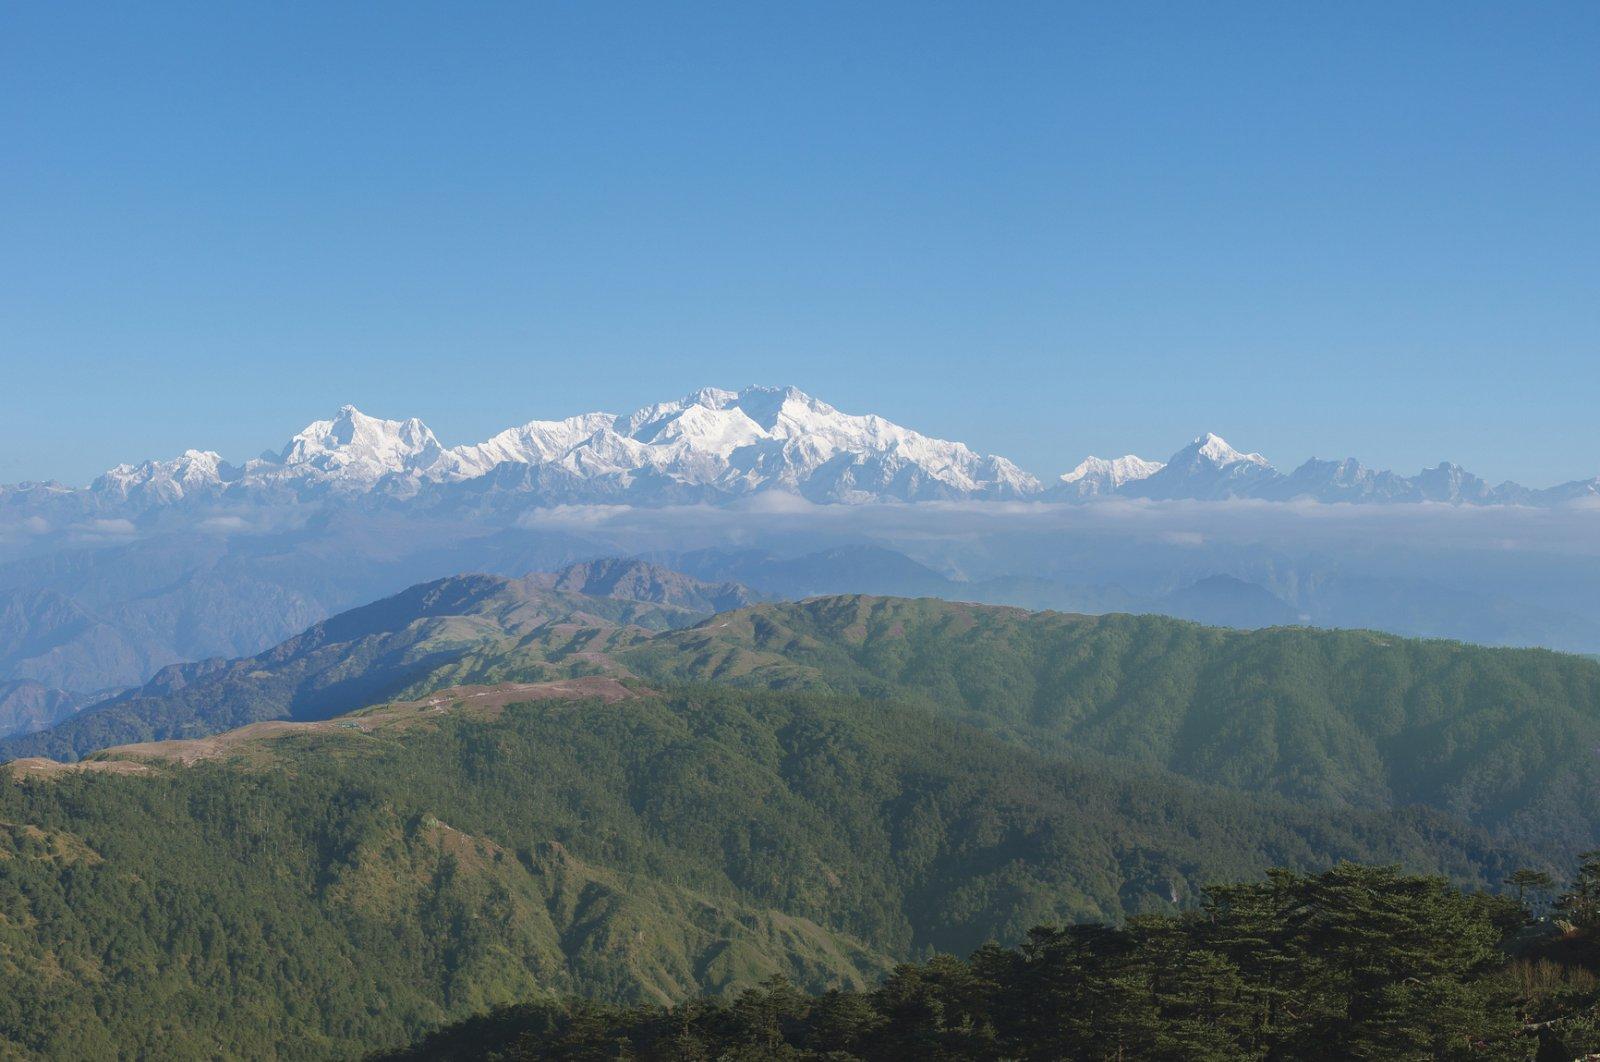 The Kanchenjunga mountain range is seen from Sandakphu, Darjeeling in India. (iStock Photo)